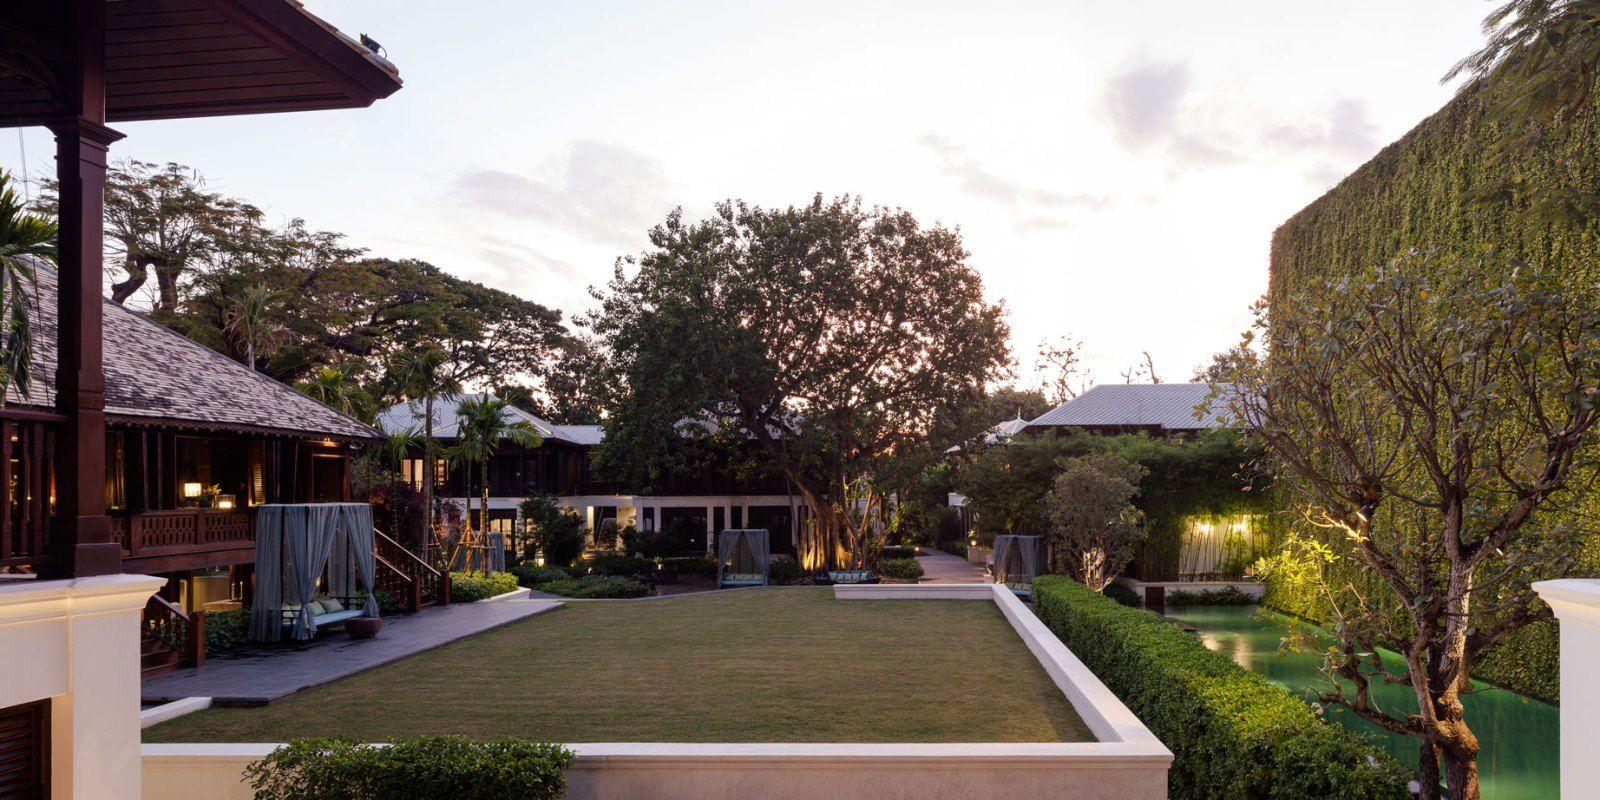 137 Pillars Hotel Landscape Design I By P